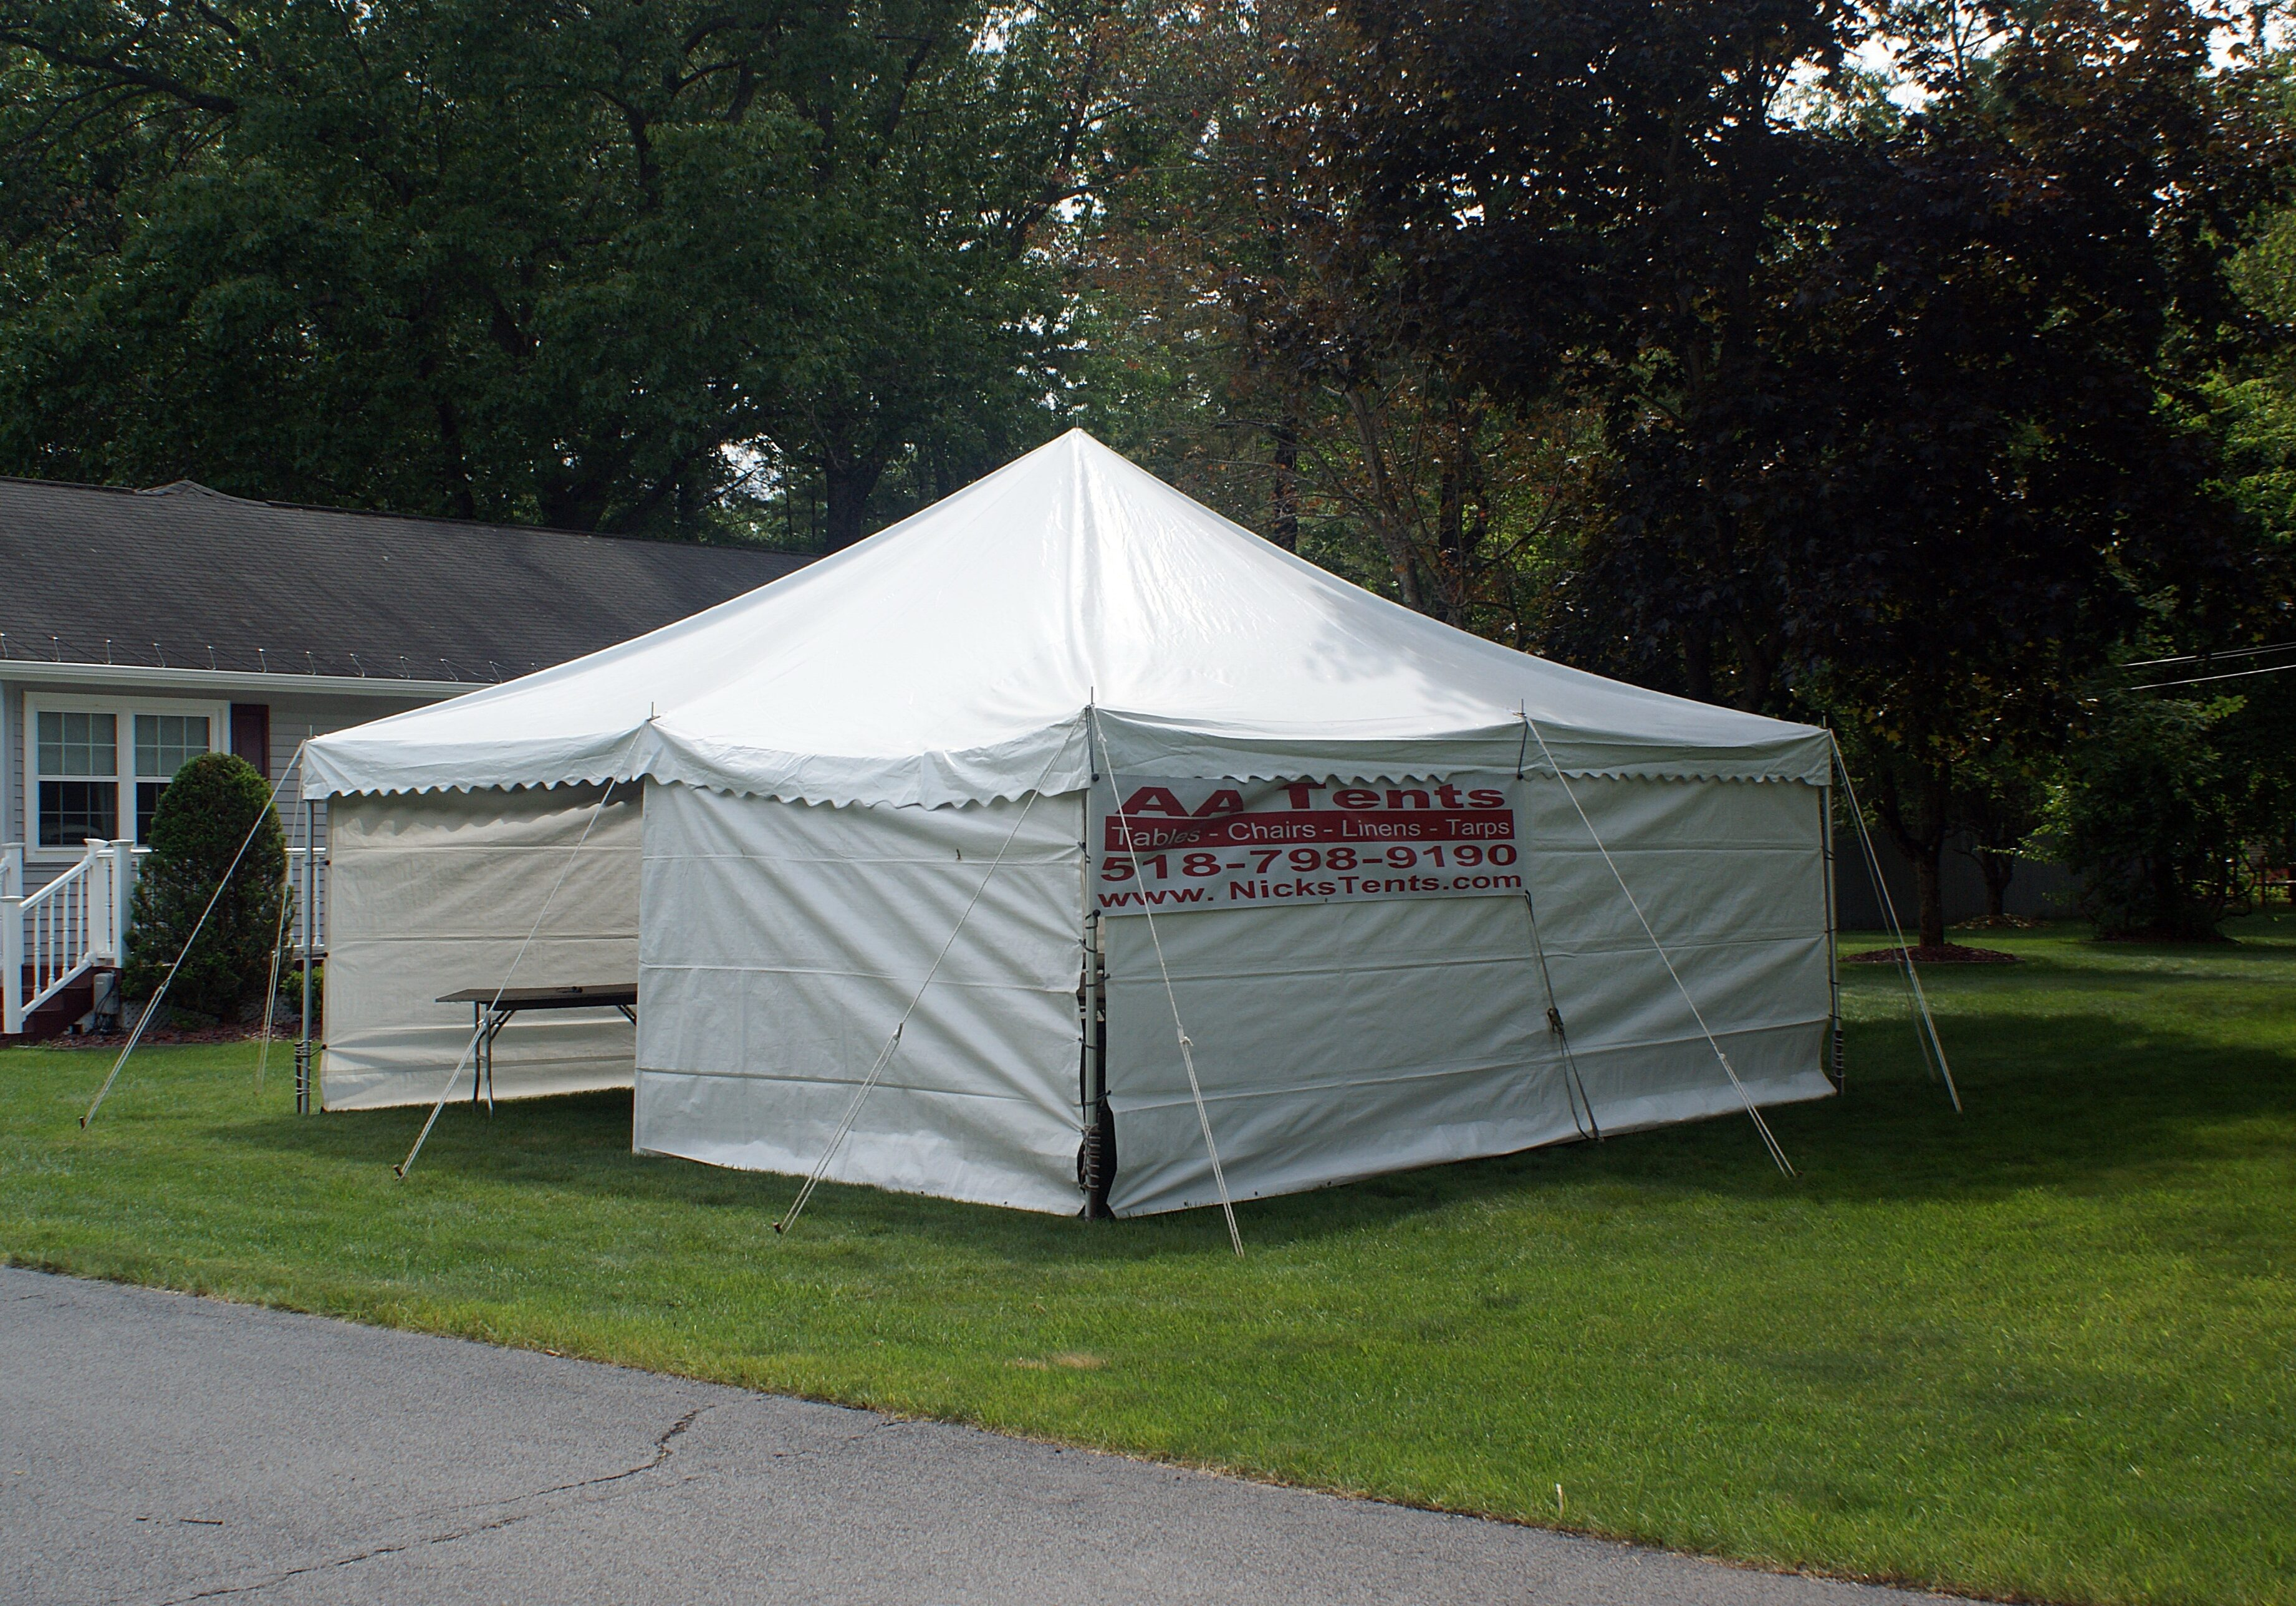 20' x 20' White Pole Tent